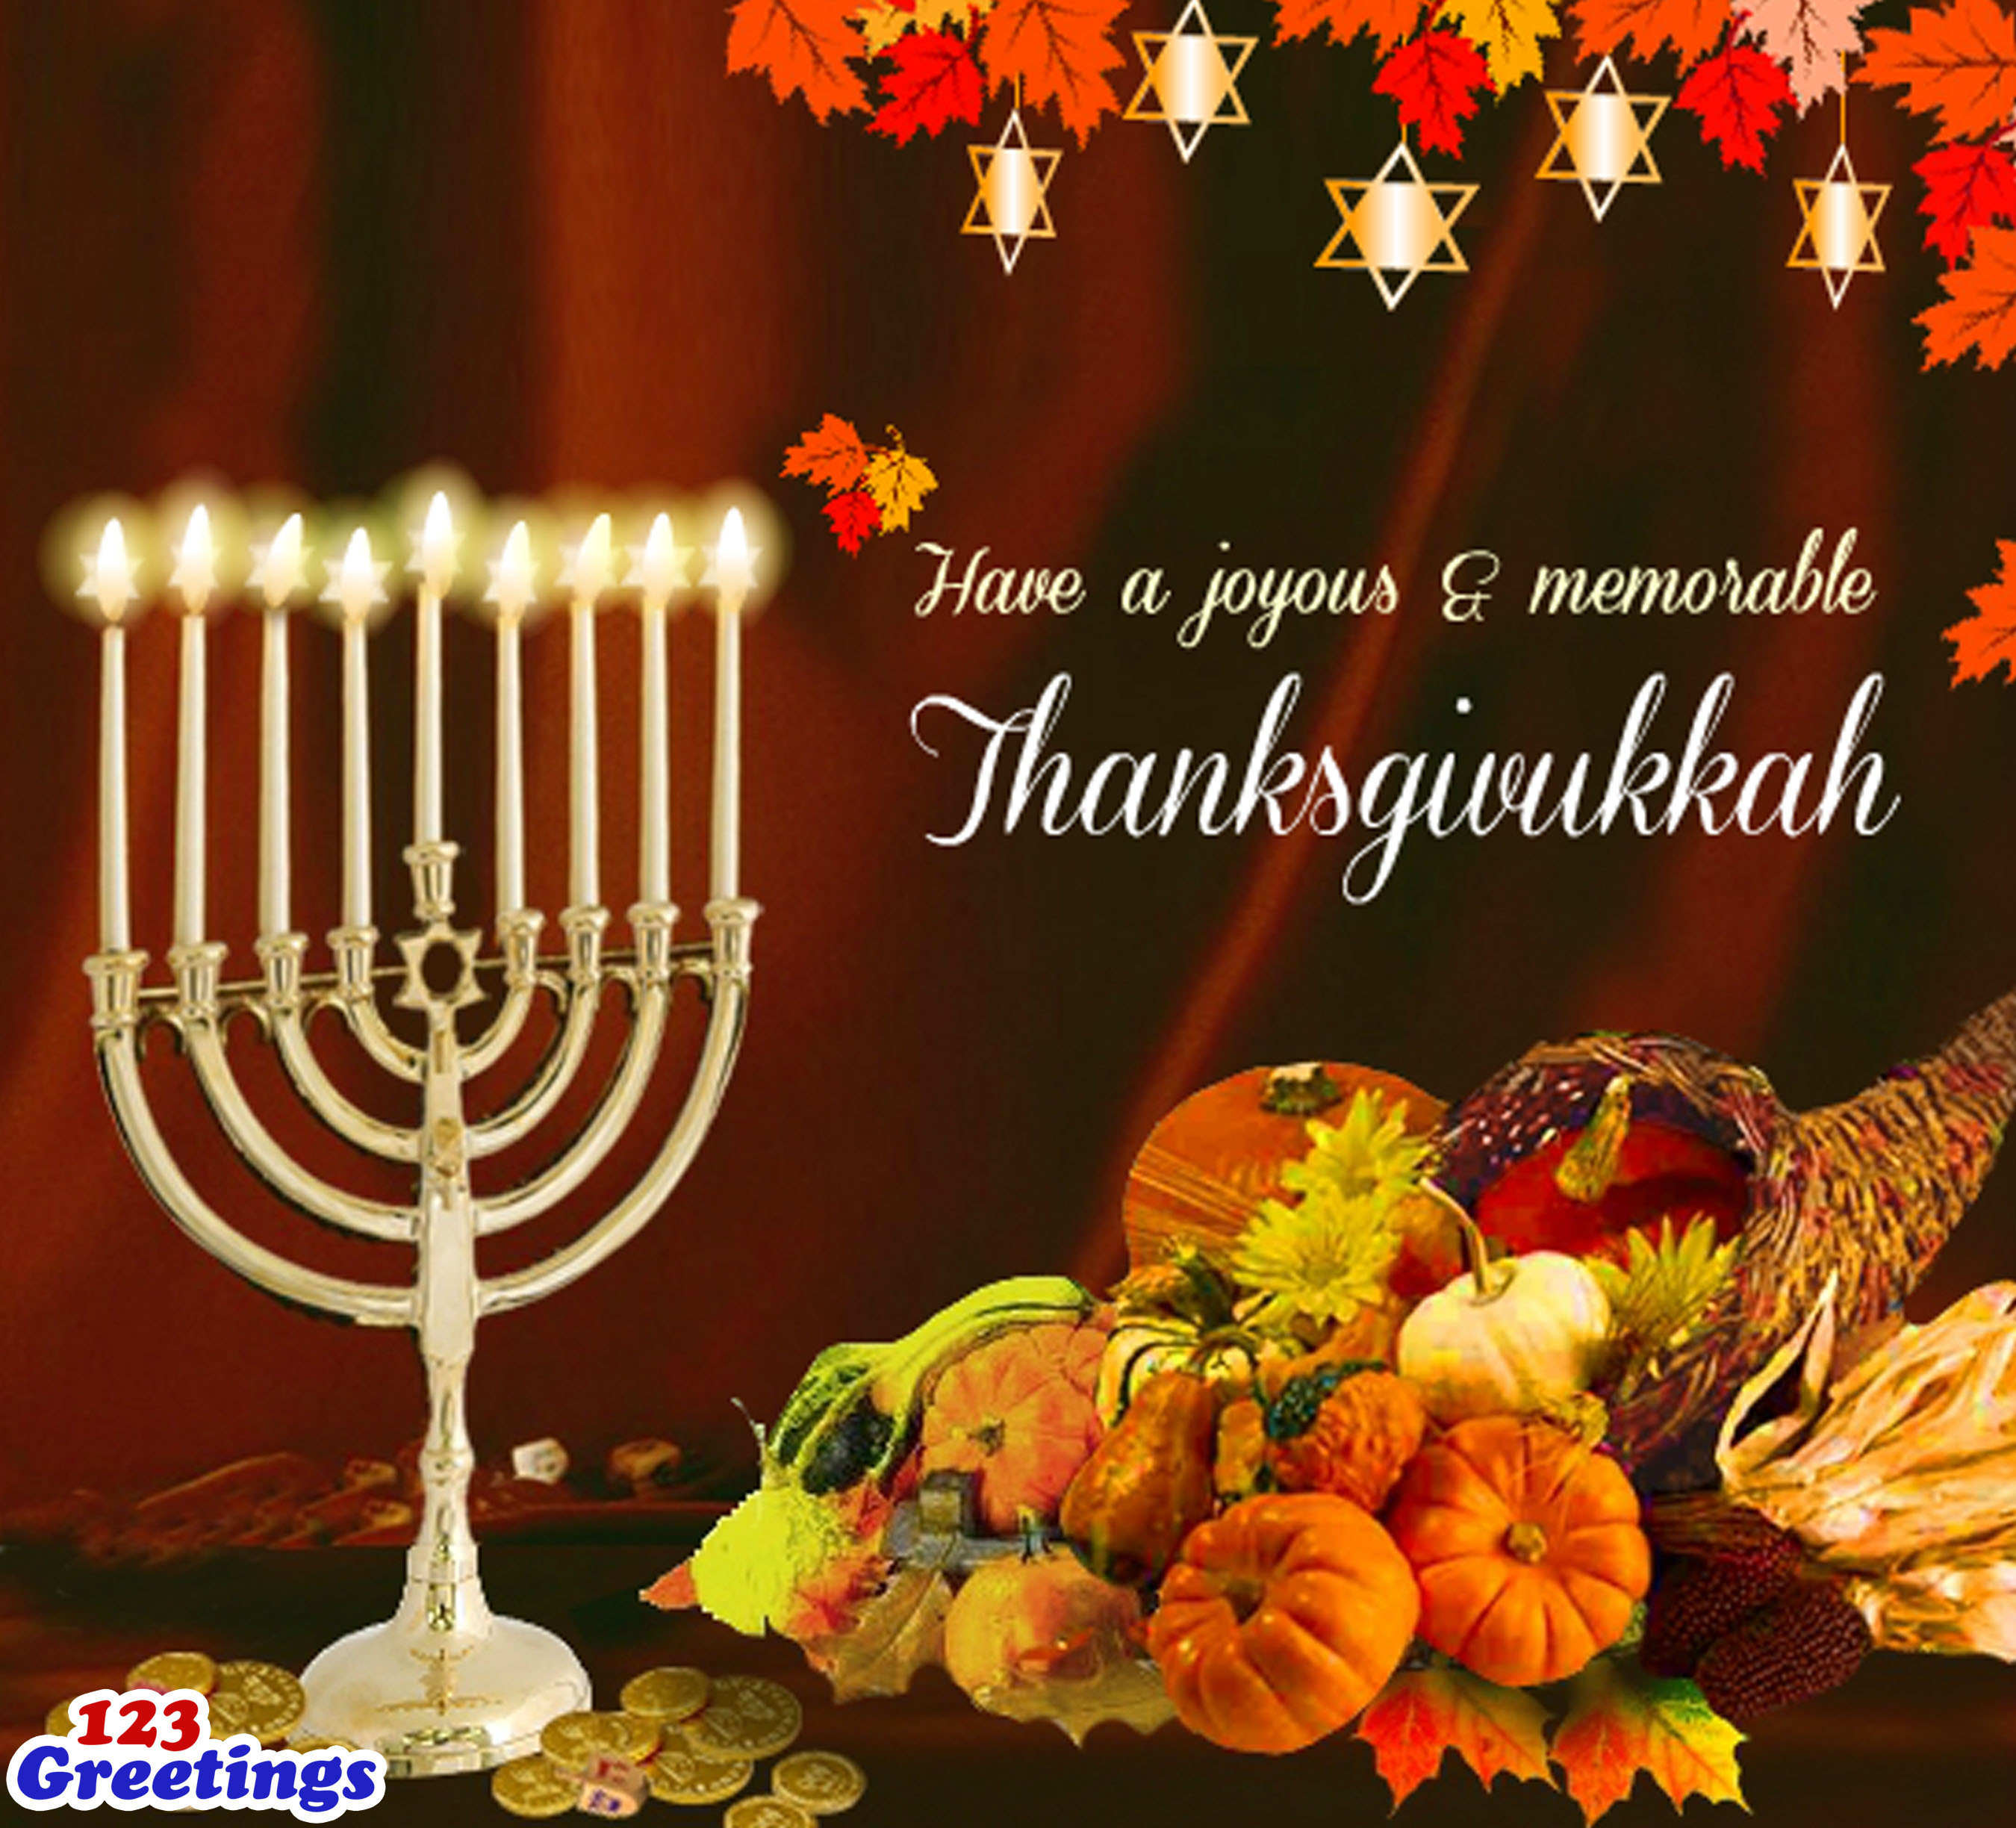 Happy Thanksgivukkah! (PRNewsFoto/123Greetings.com) (PRNewsFoto/123GREETINGS.COM)